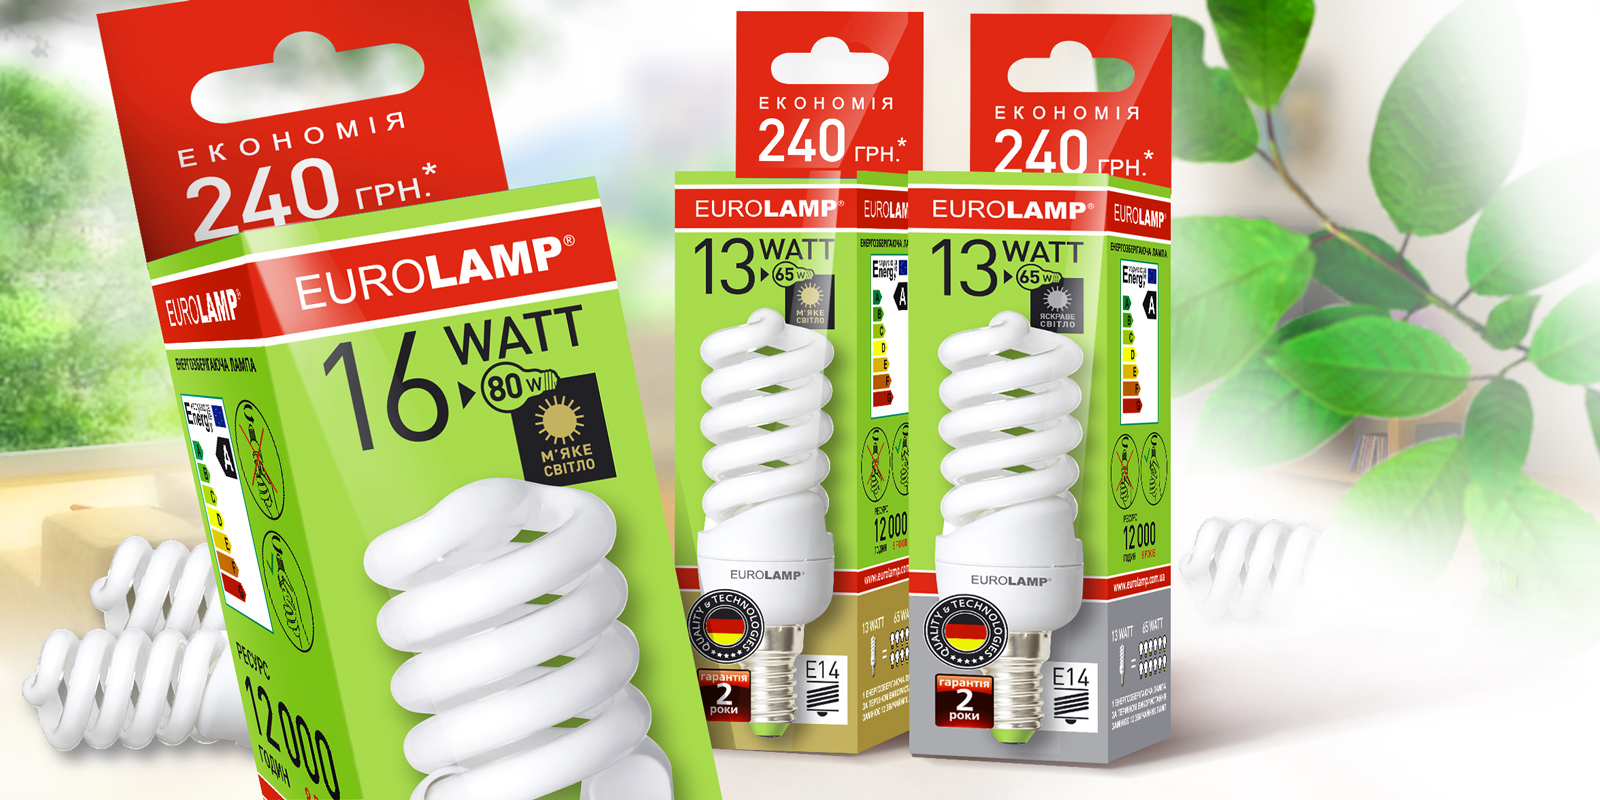 TM Eurolamp;;;;;;Разработка упаковки;;;;;;<span>Клиент:</span> TM Eurolamp;;;;;;;;;;;;Разработка упаковки;;;;;;2